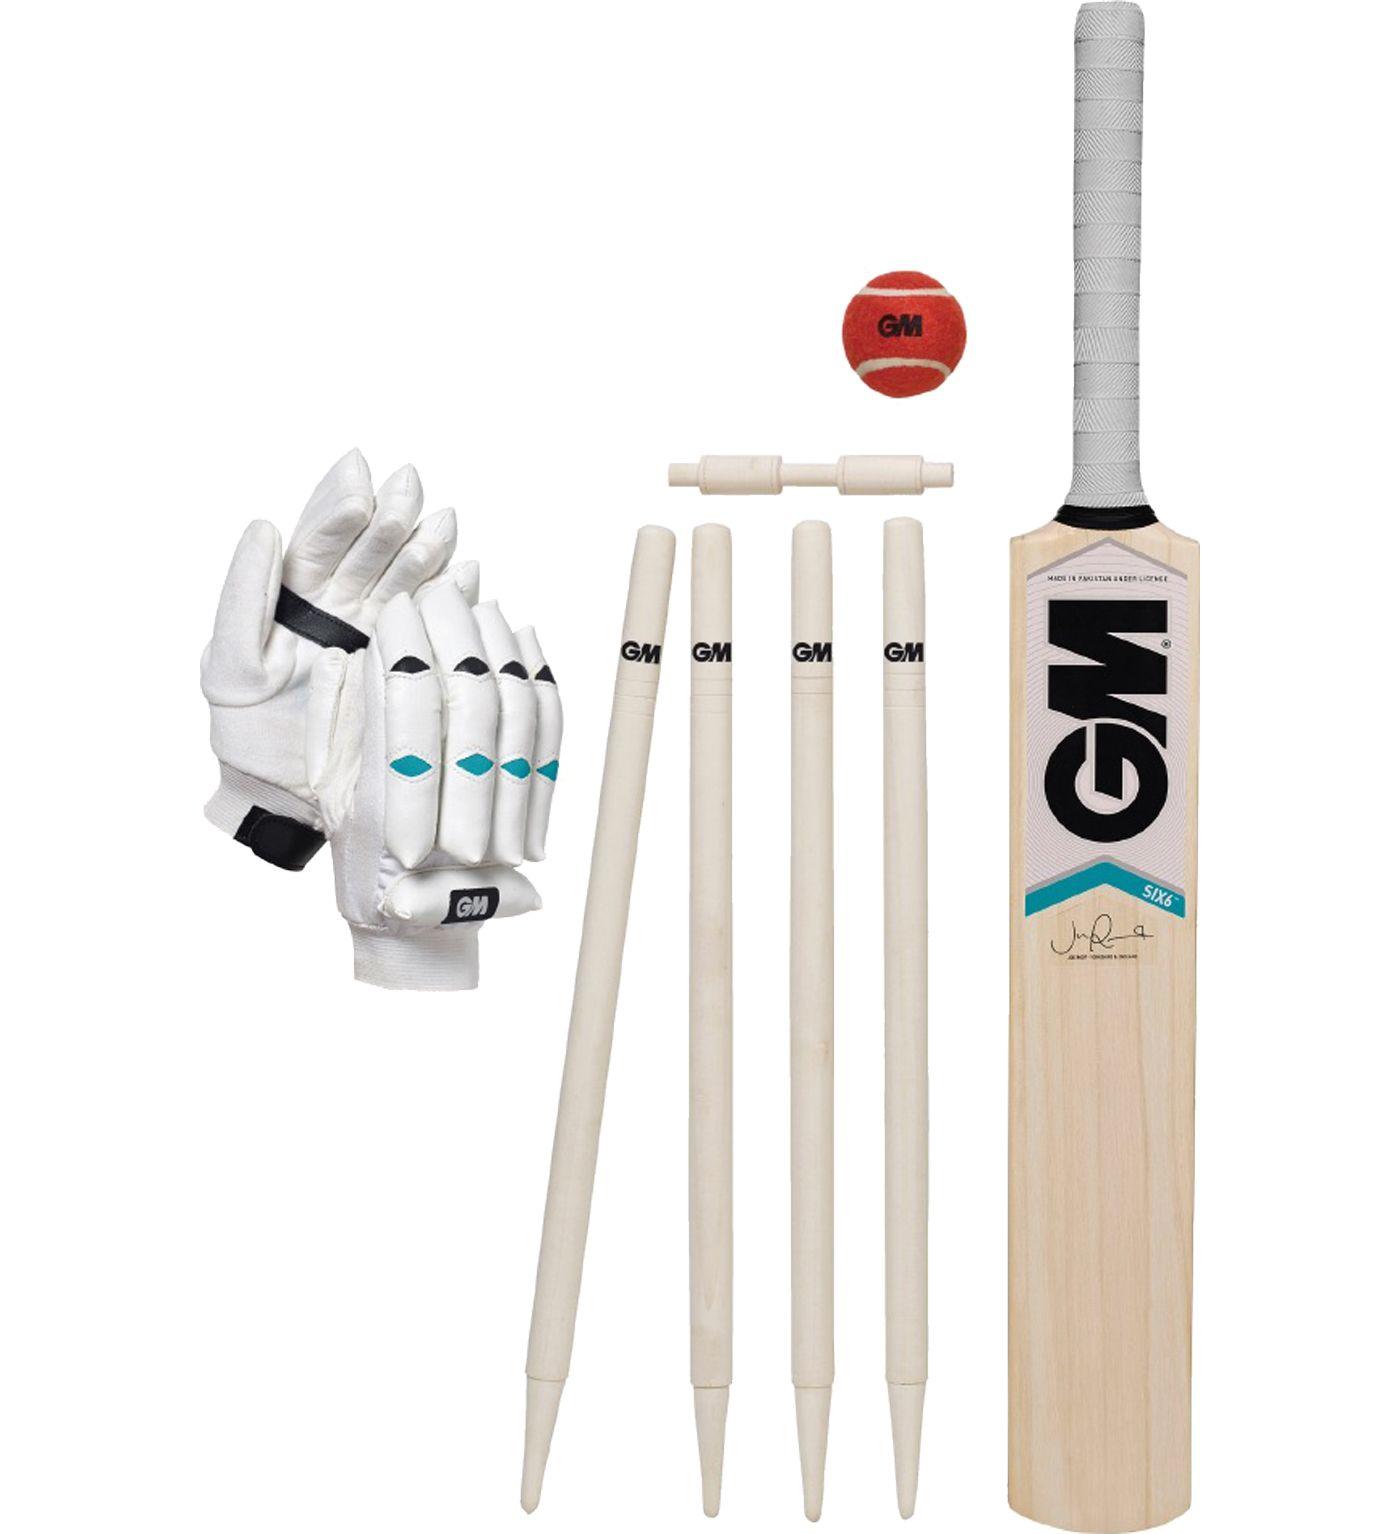 Gunn & Moore Youth Six6 Size 6 Cricket Bat Set